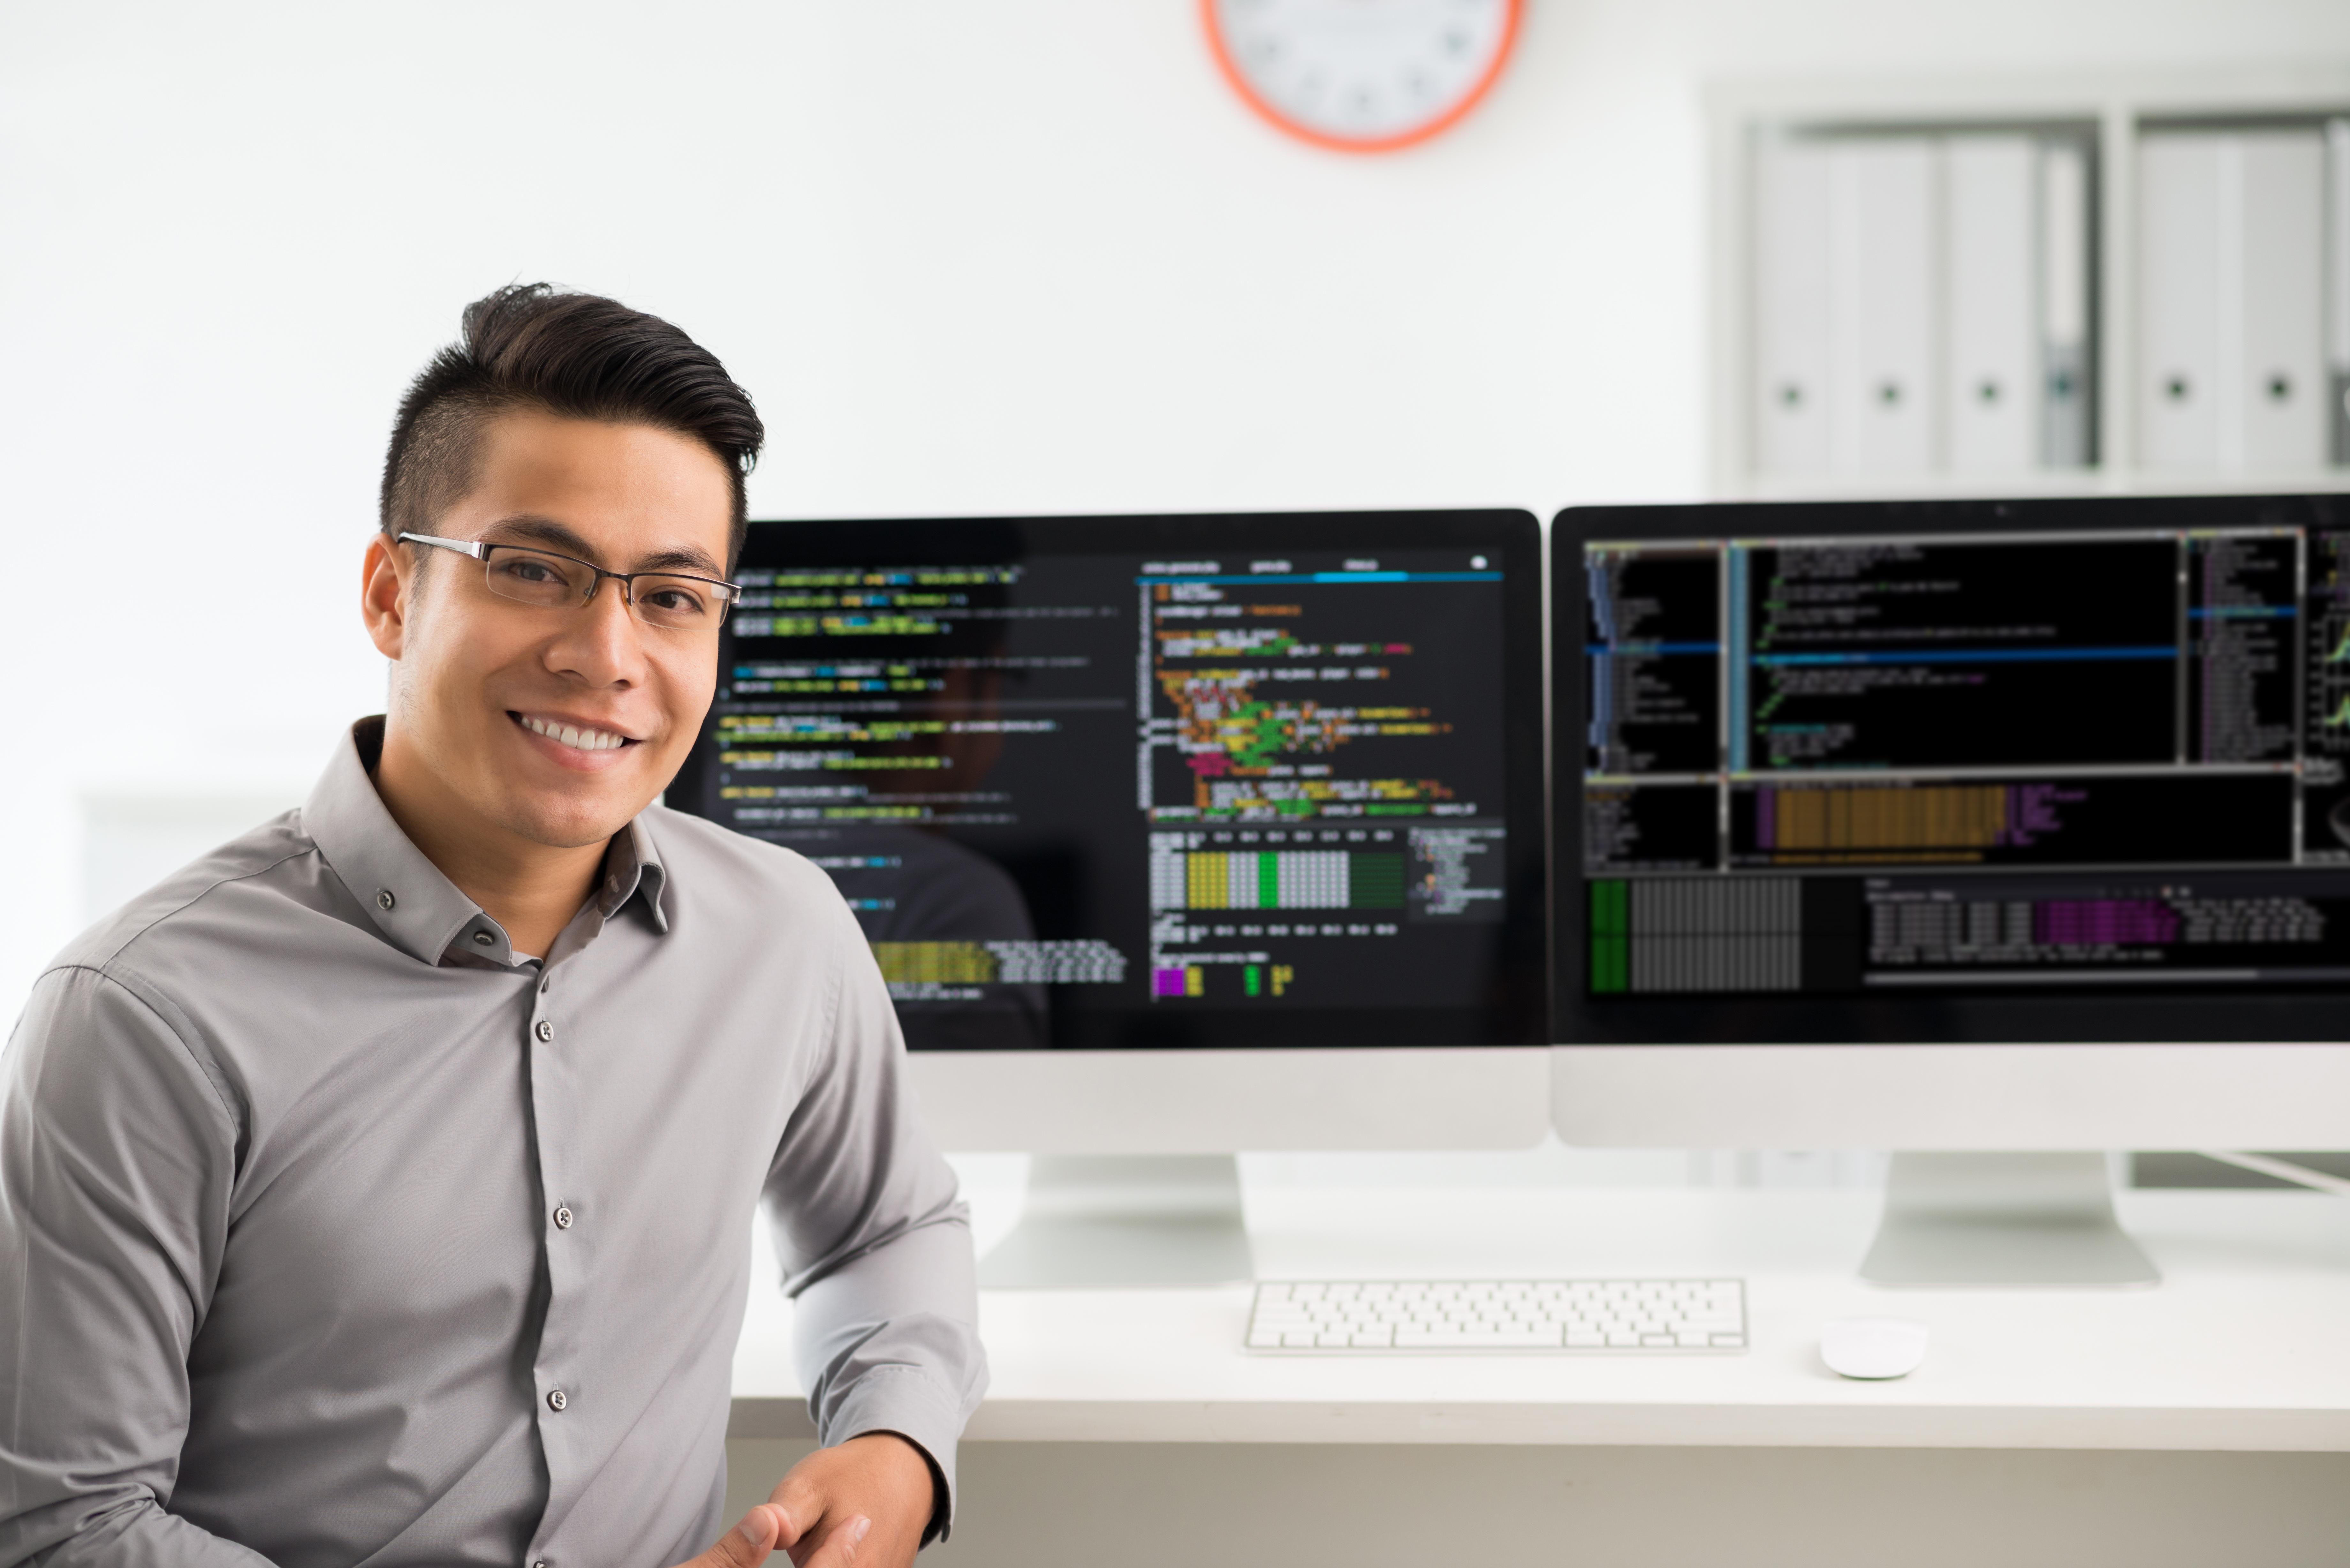 24/7 System Integrator Support